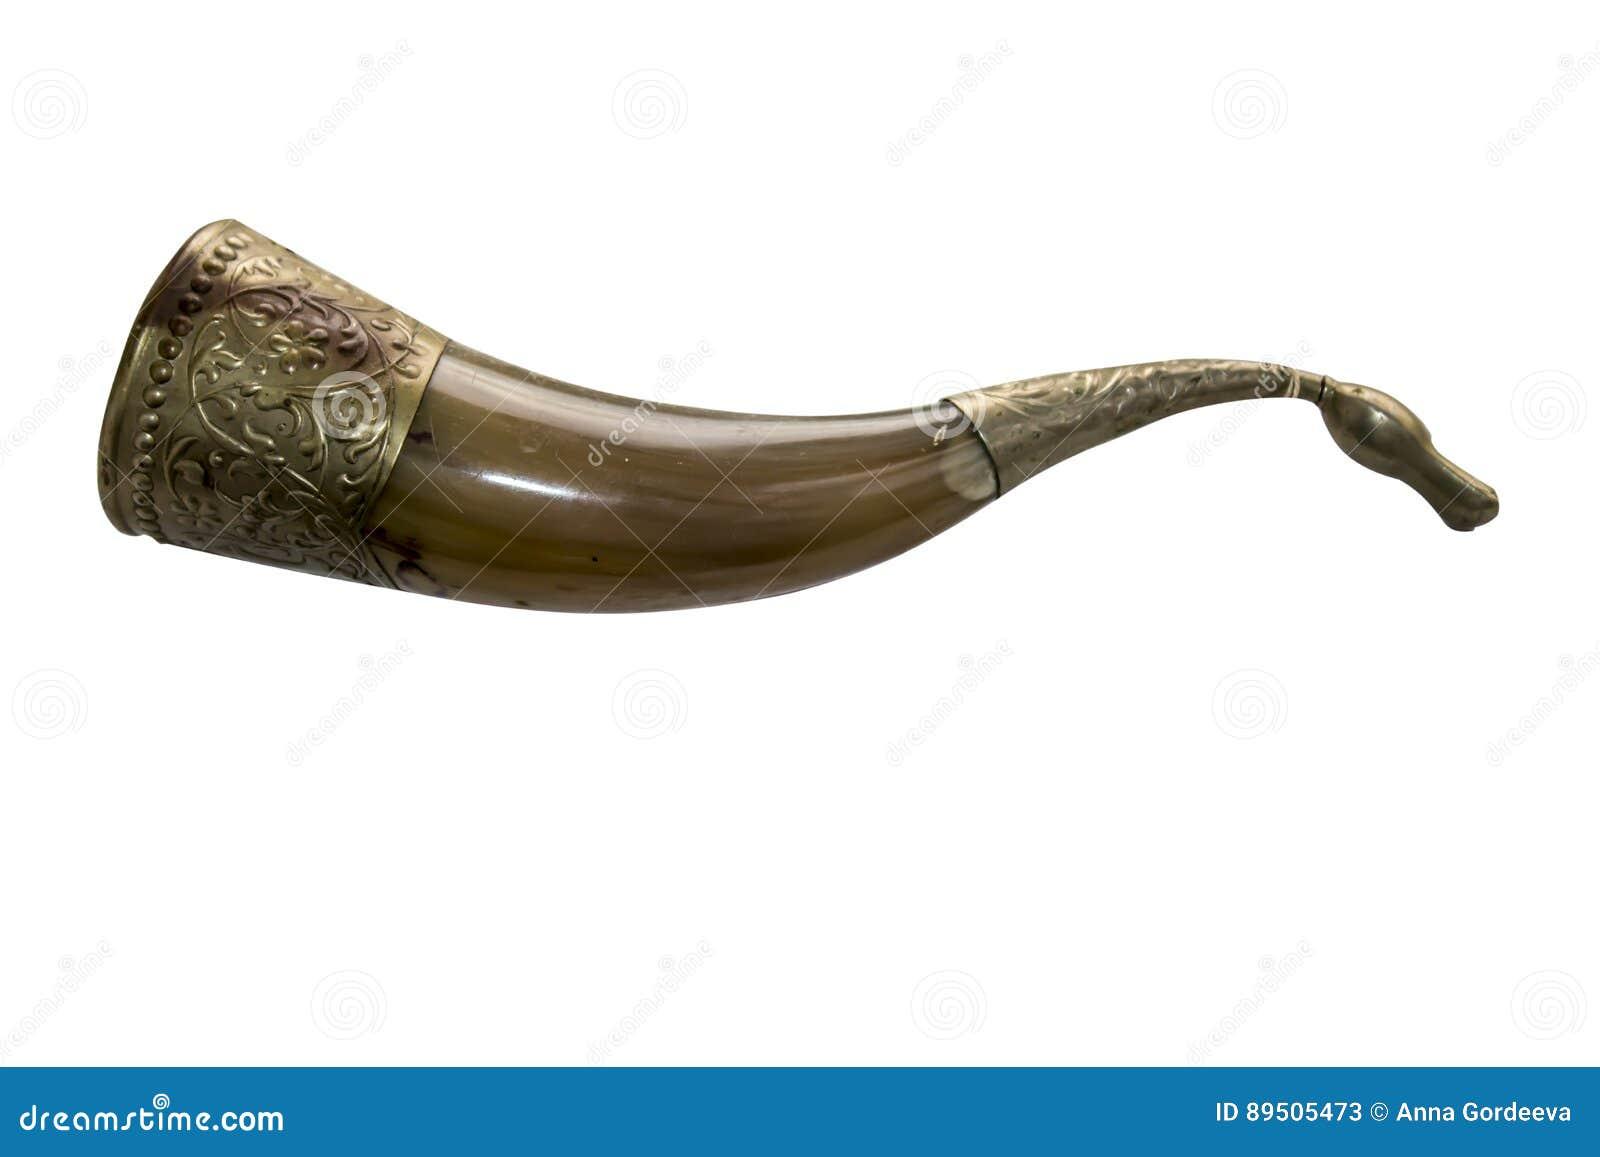 Powder flask horn ornament